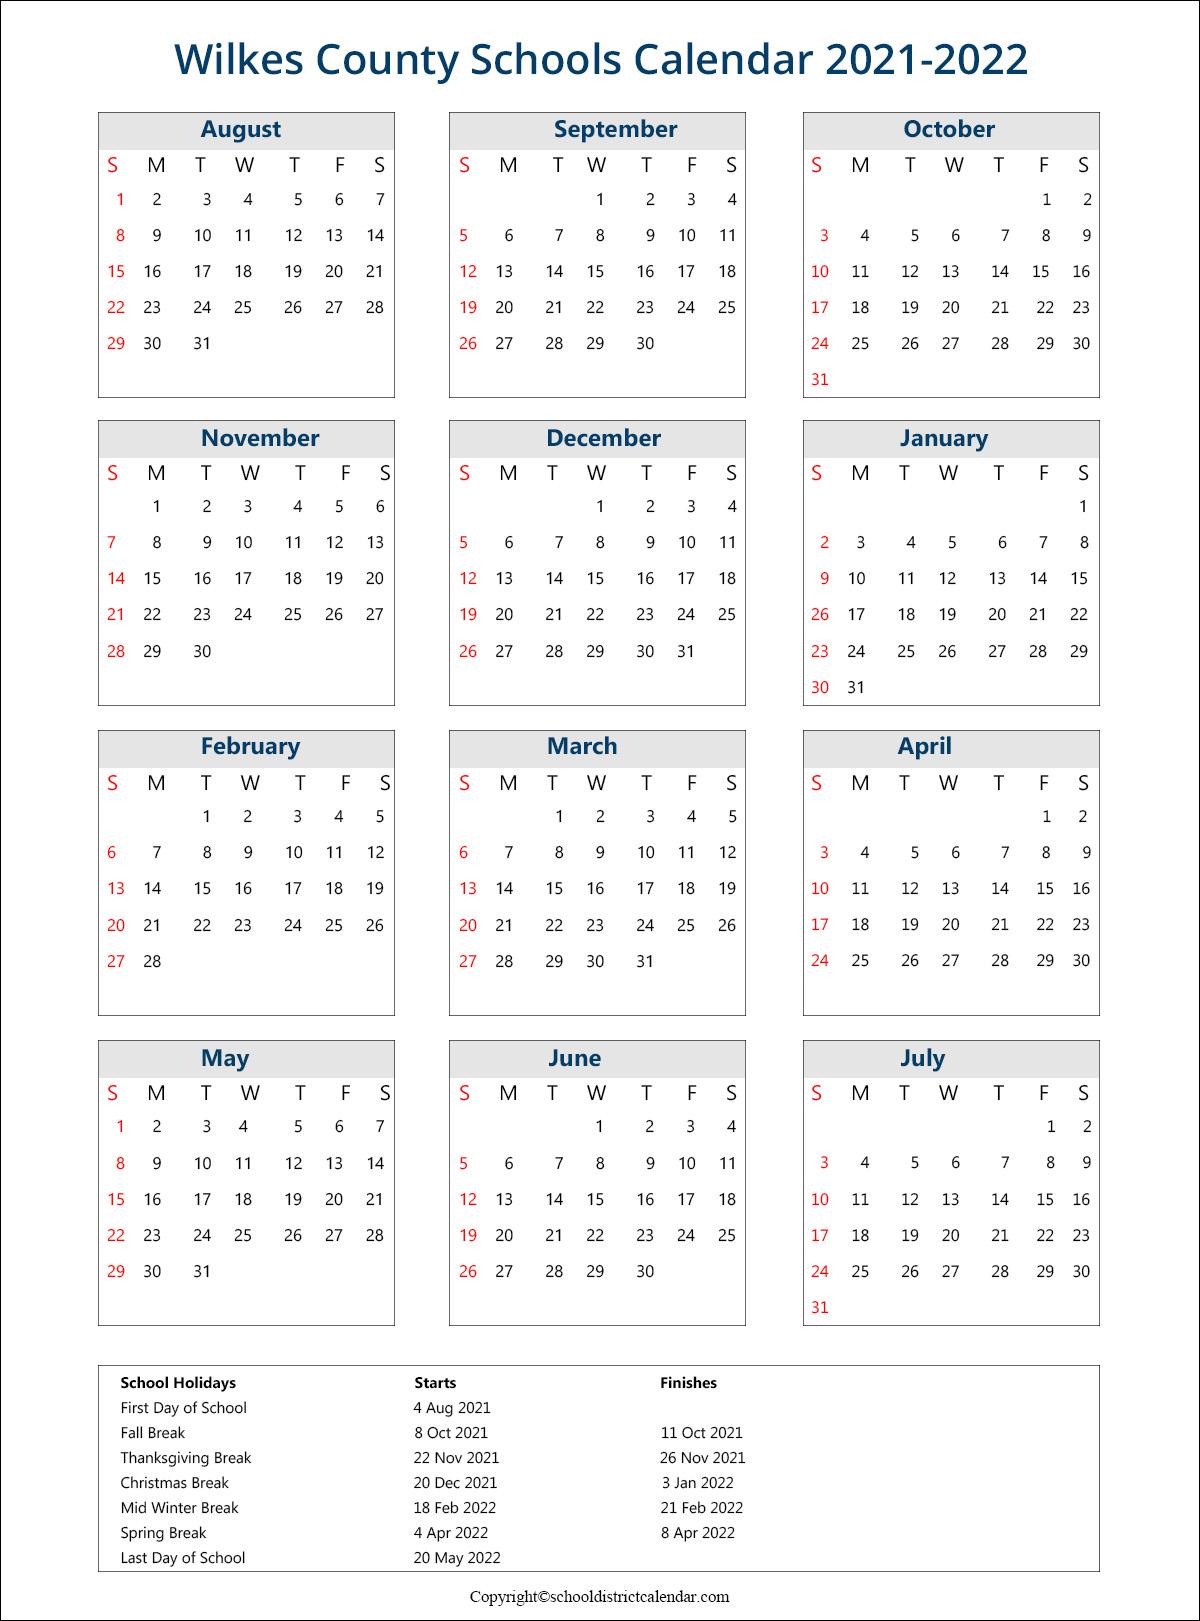 Wilkes County Schools Calendar 2021